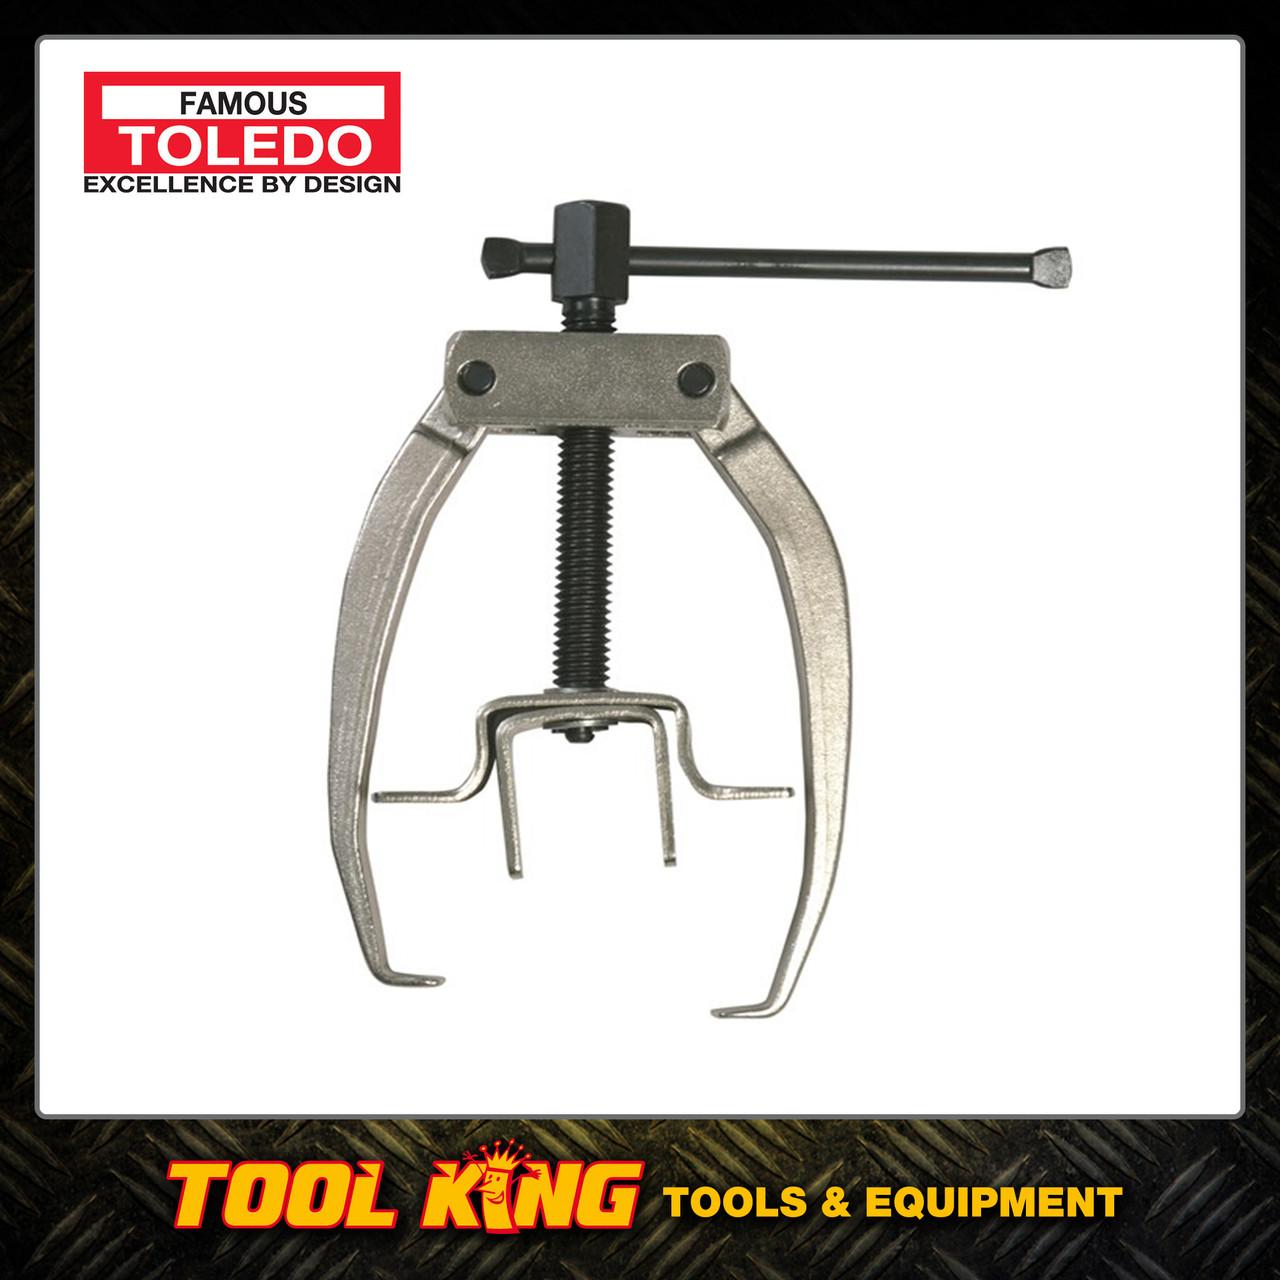 Valve spring compressor TOLEDO professional